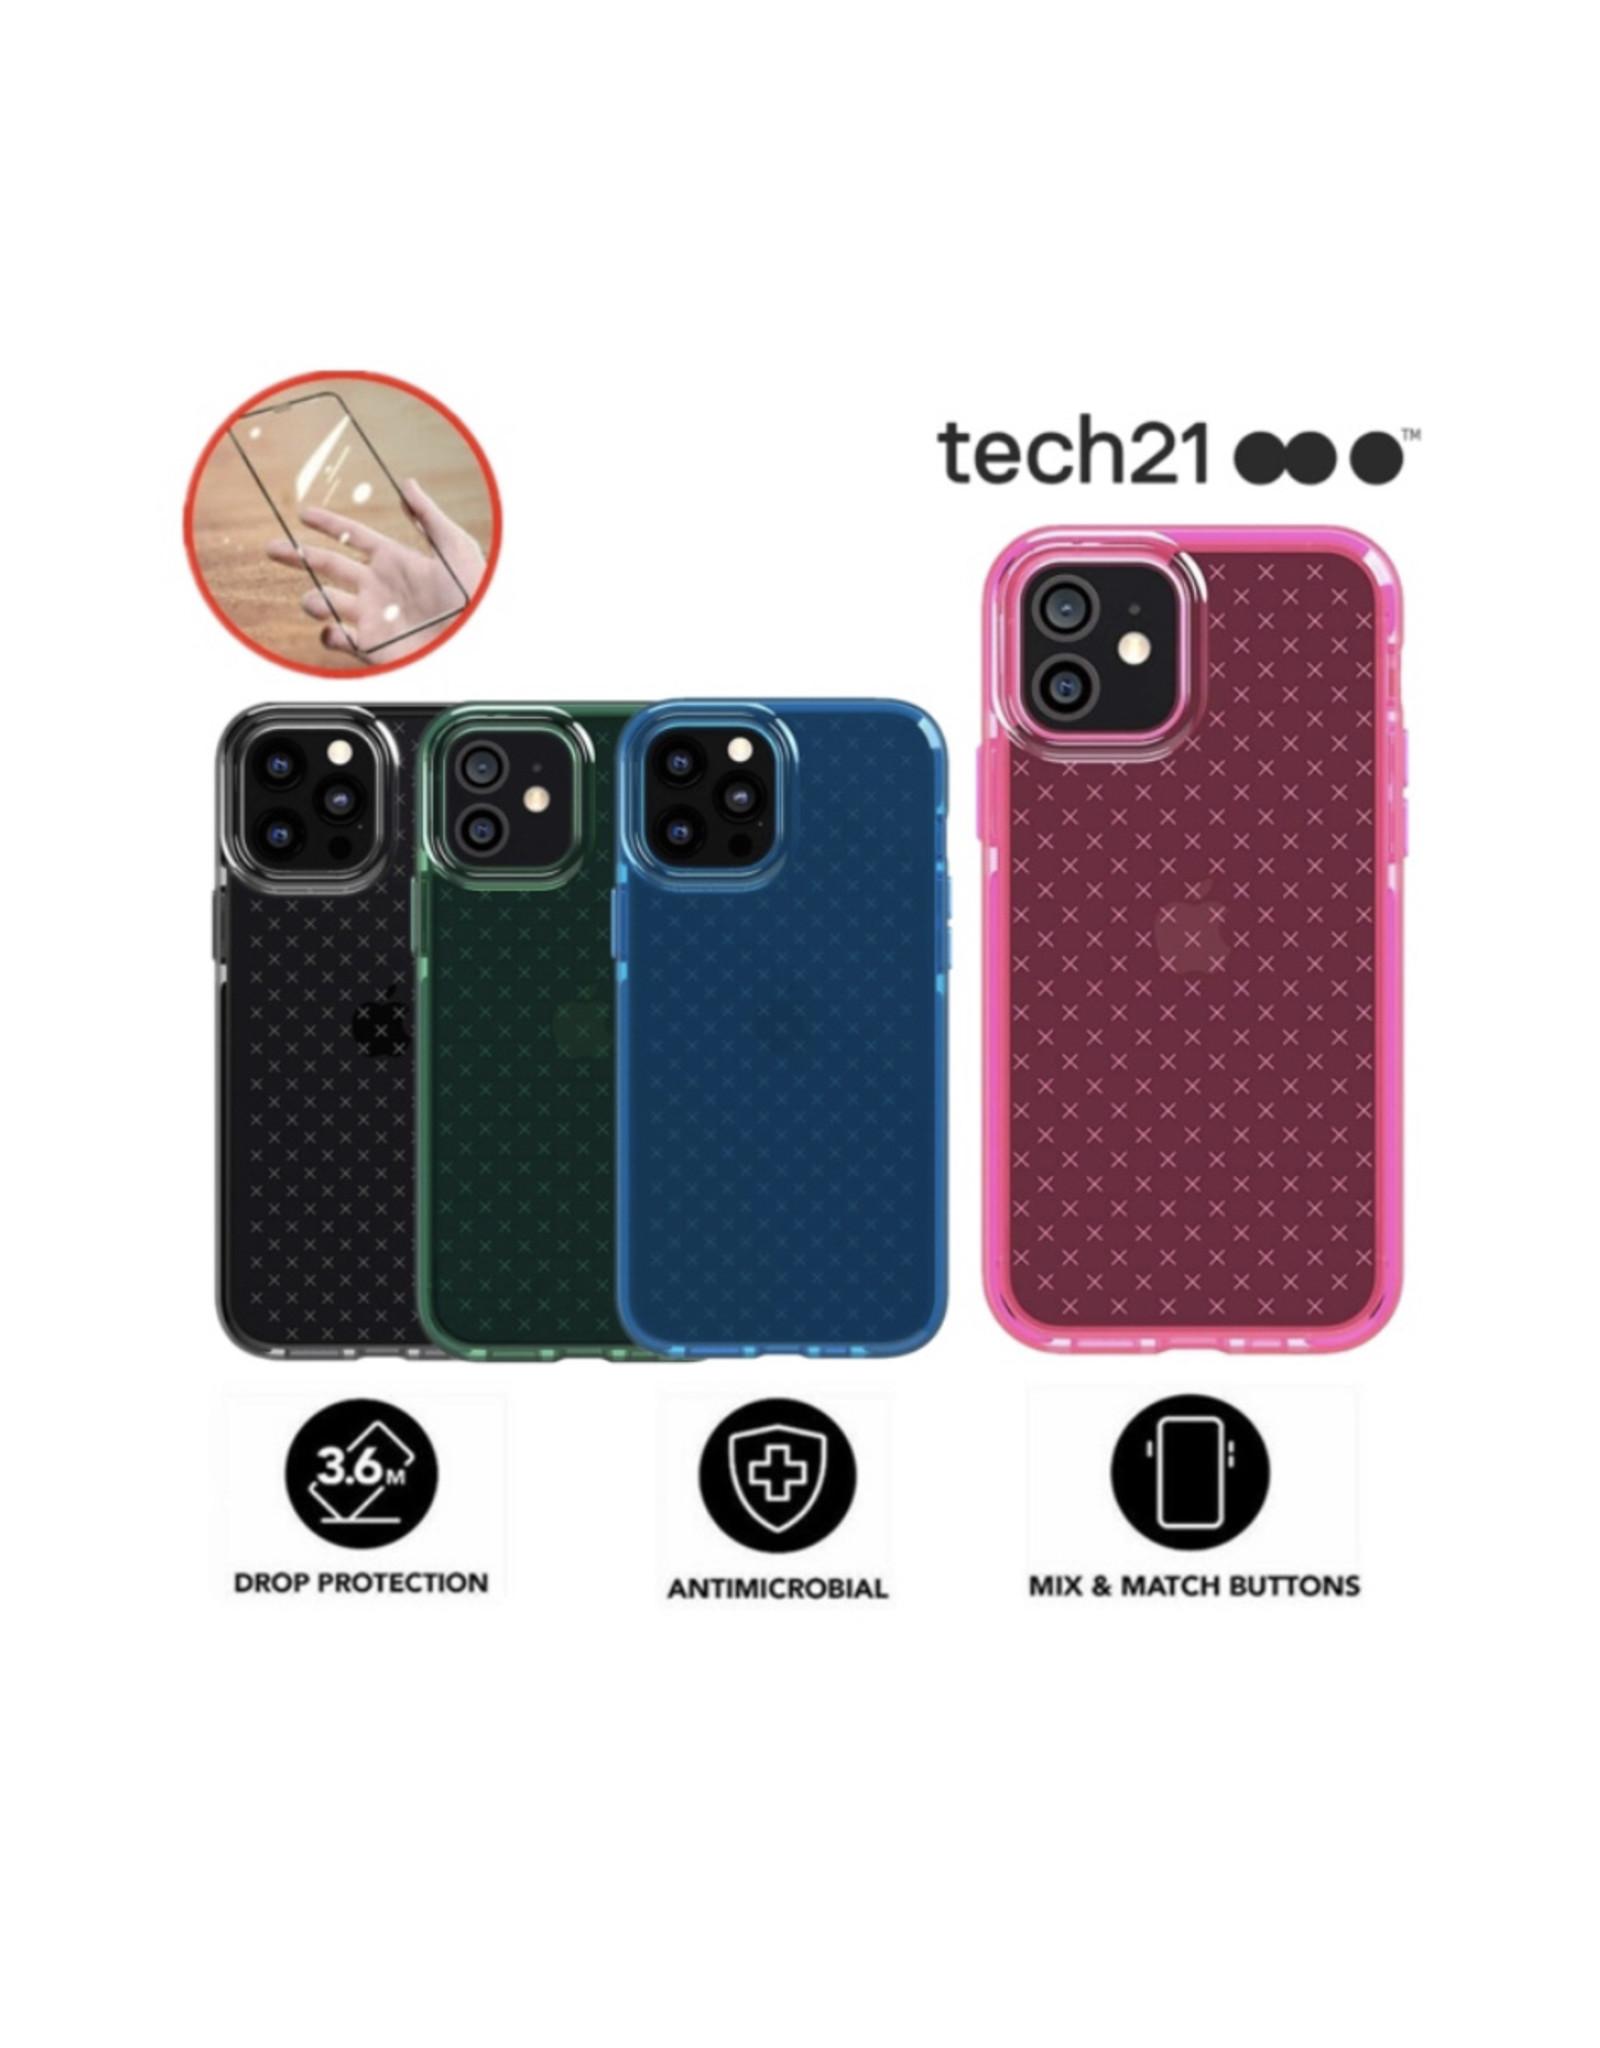 Tech21 Tech21 EvoCheck Shockproof Case